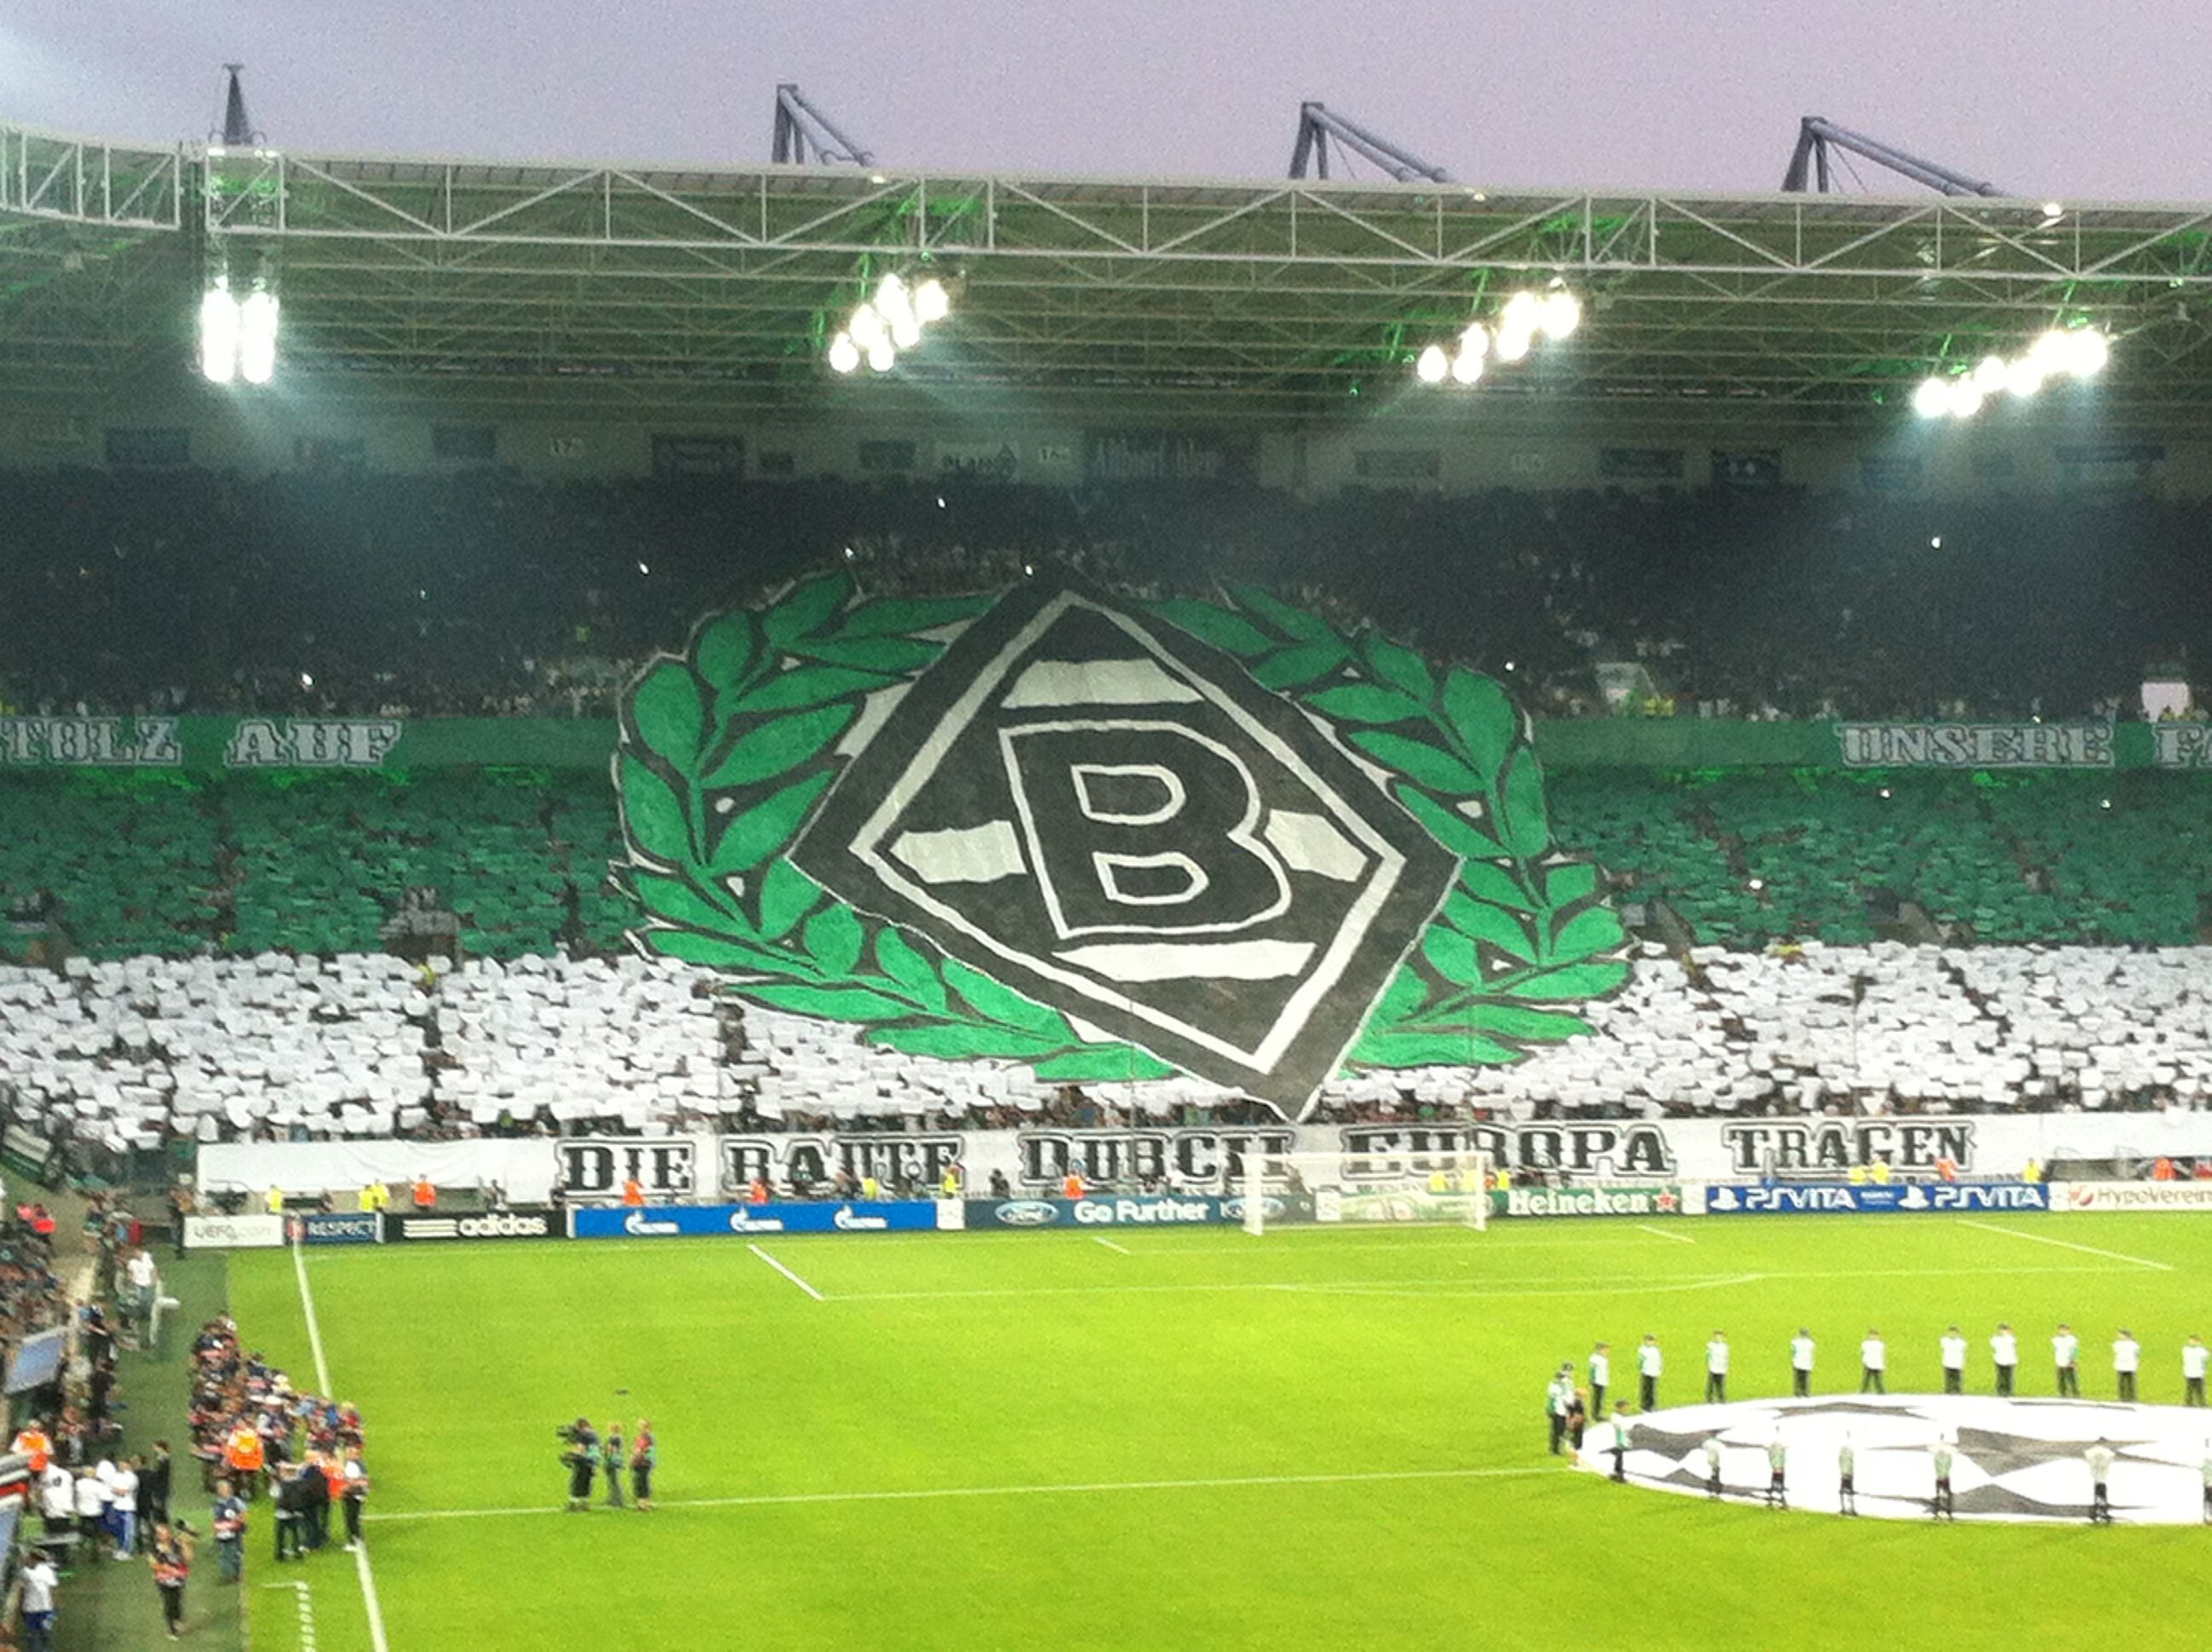 Borussia Park In Monchengladbach Beim Hinspiel Der Champions League Gegen Dynamo Kiew Am 21 Aug Vfl Borussia Monchengladbach Borussia Monchengladbach Borussia